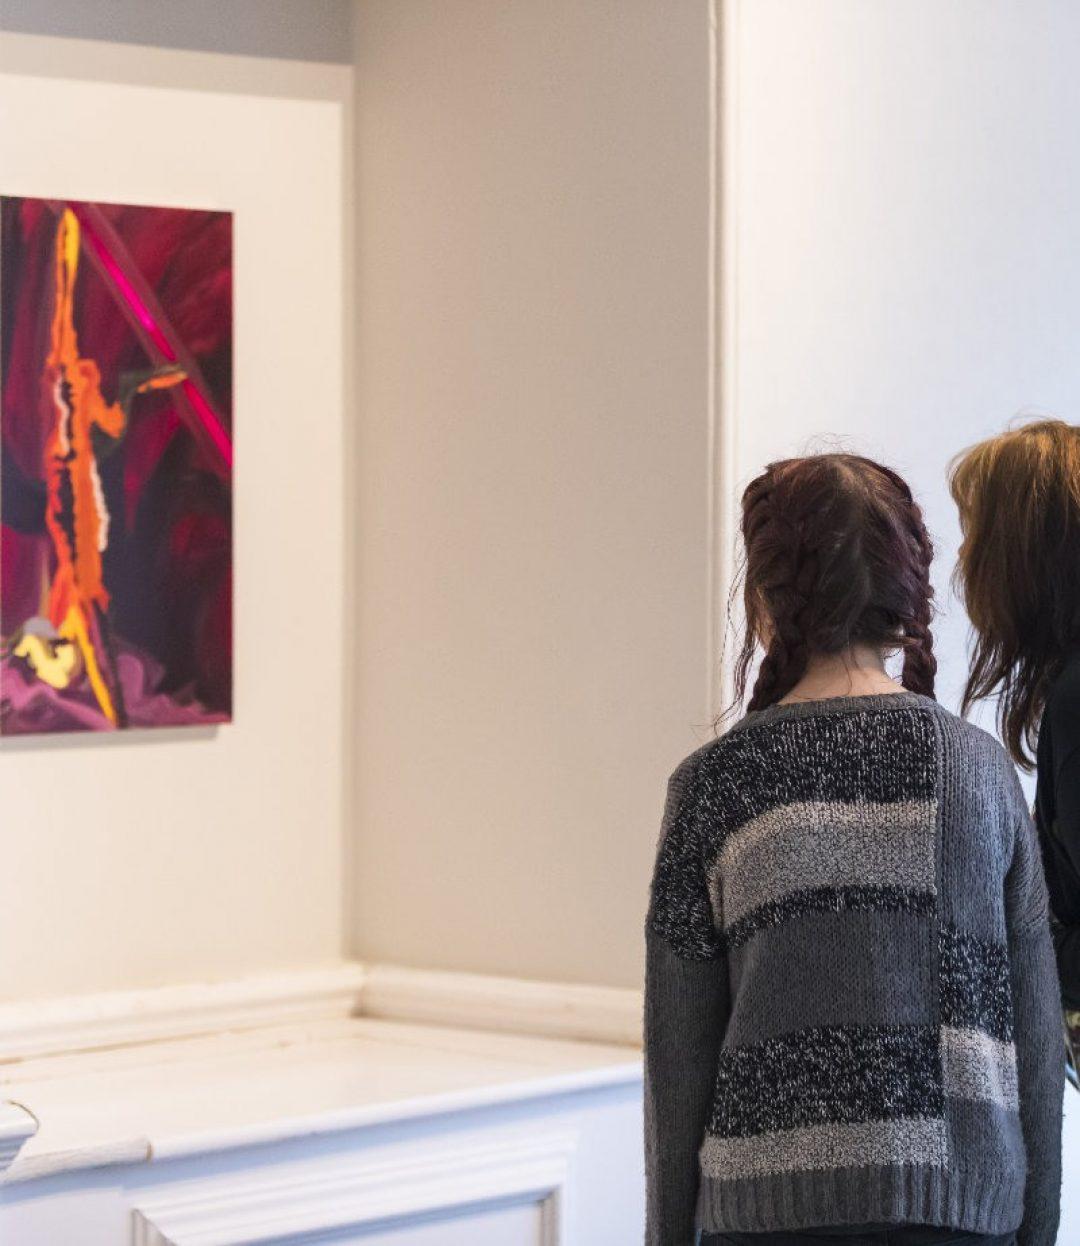 Hestercombe Contemporary Art Gallery T4 I4698 1